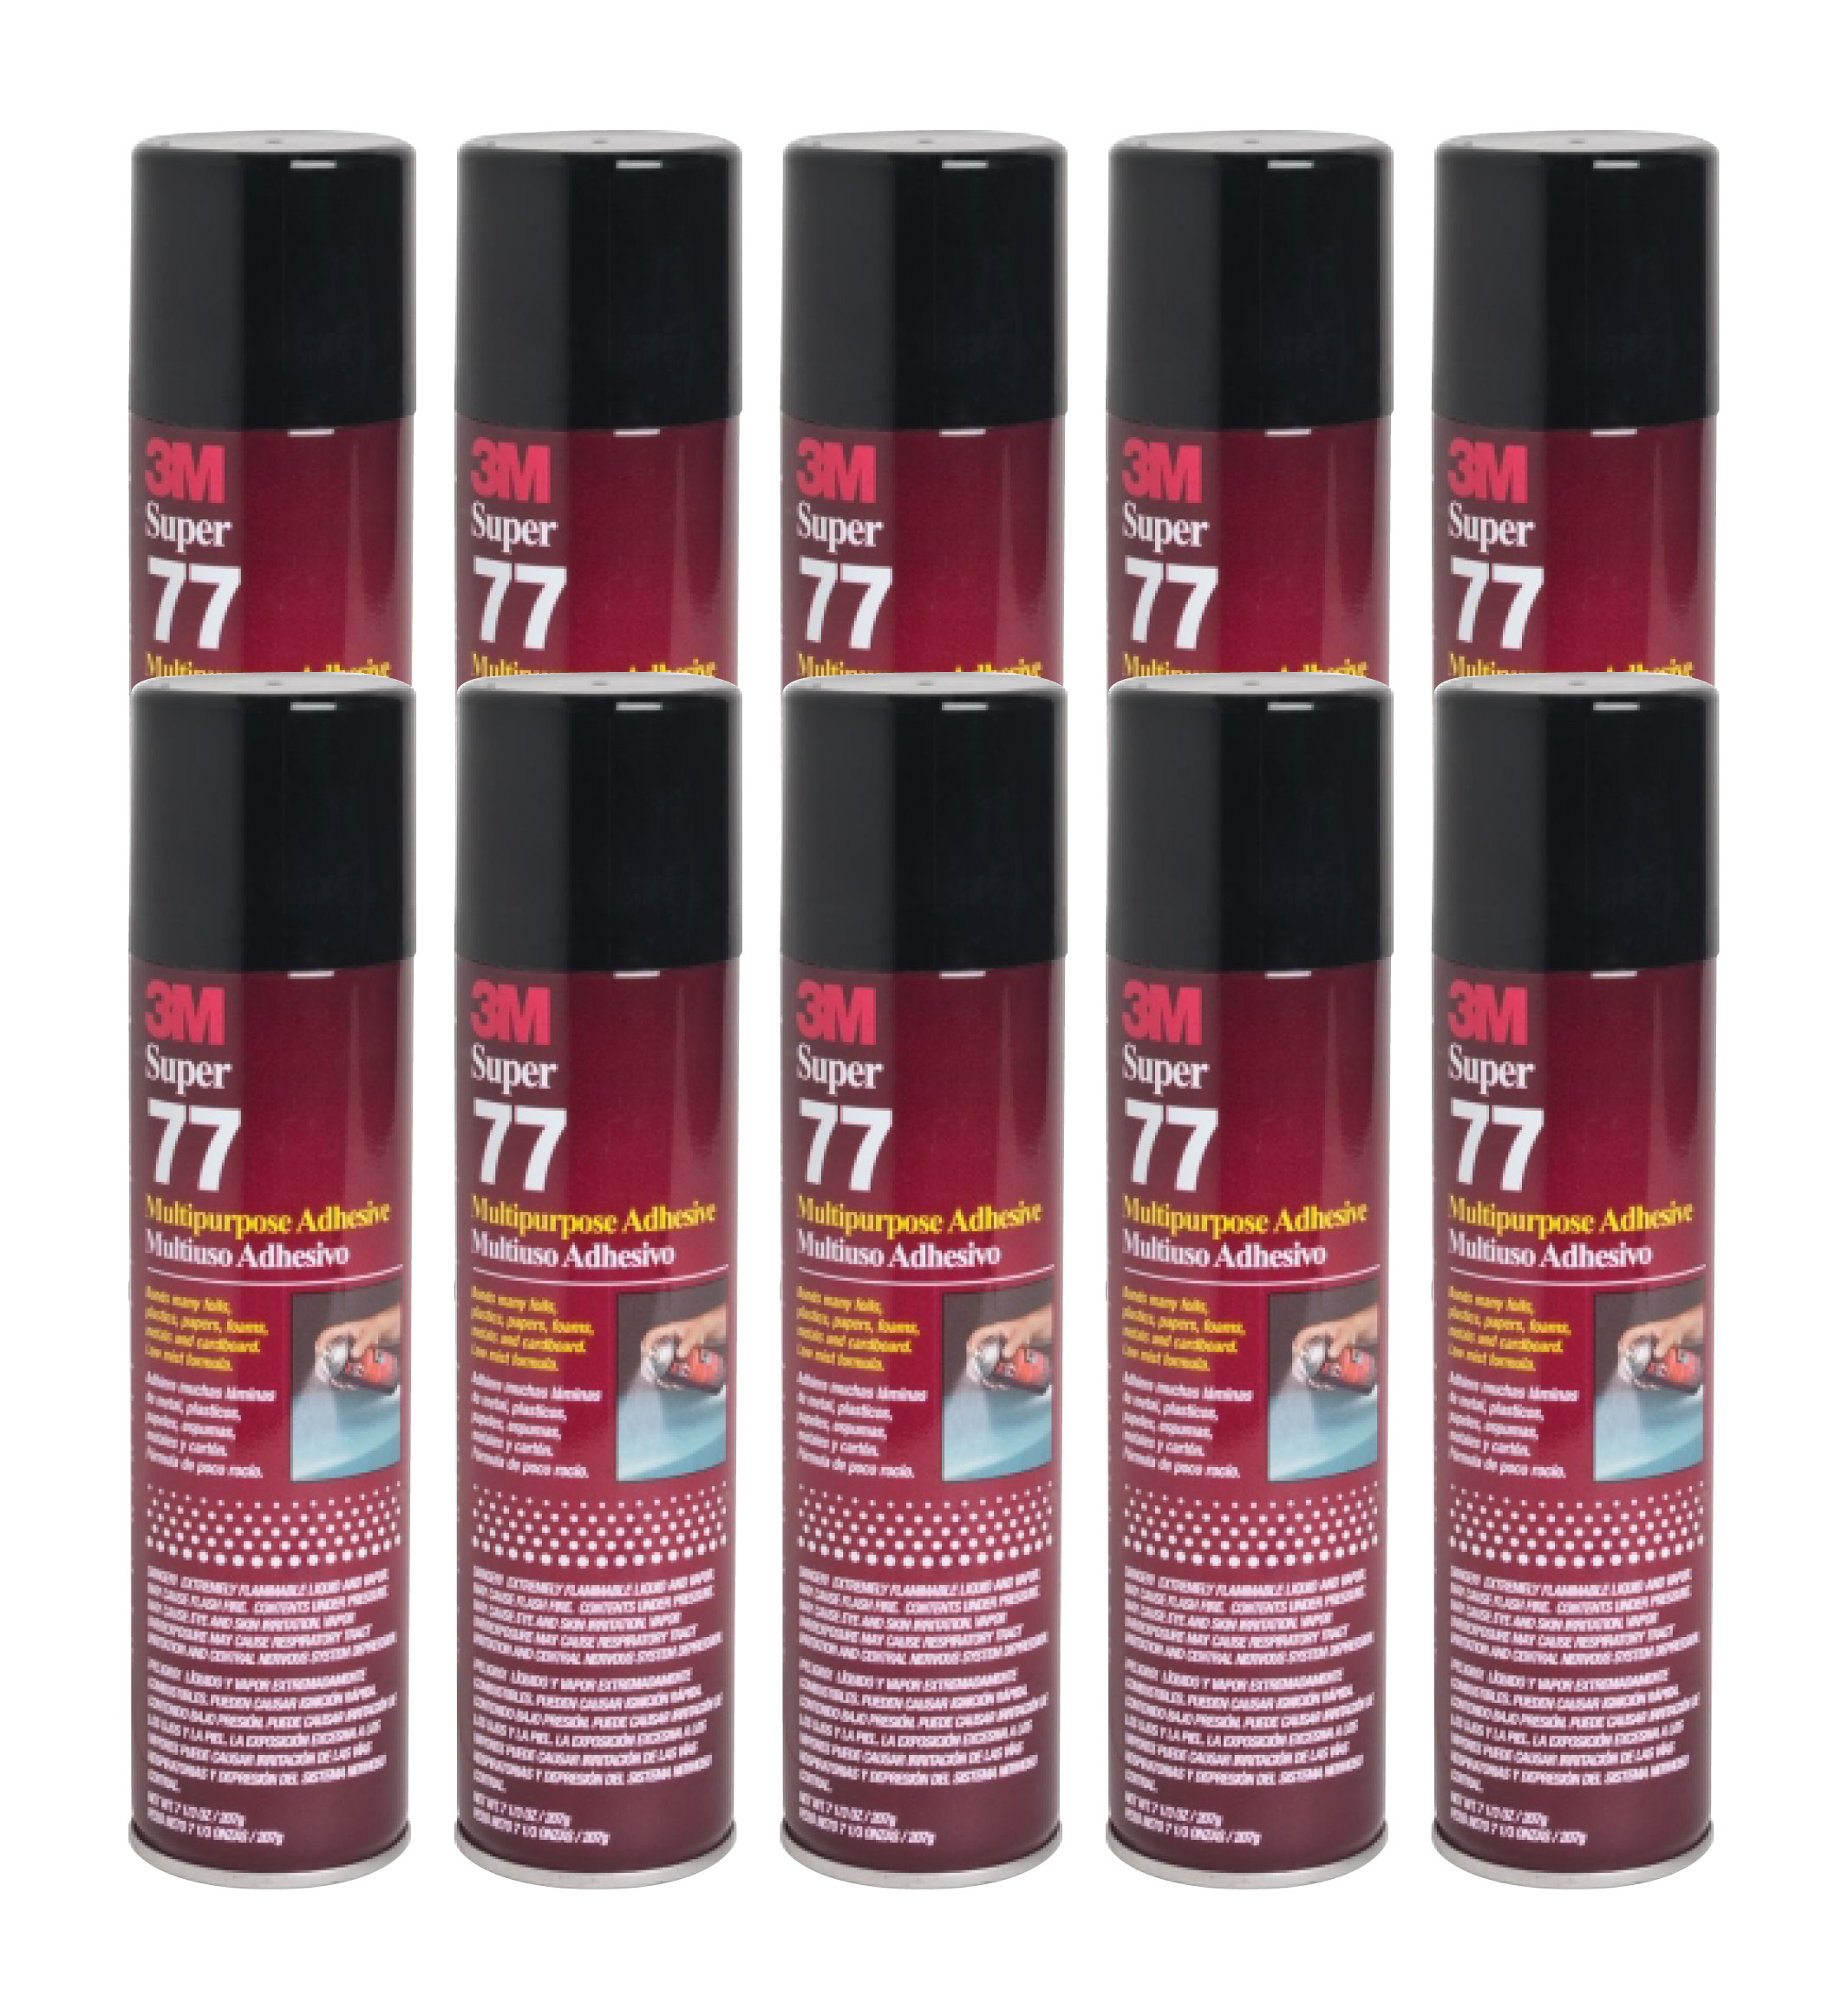 QTY 10 3M 7.3 oz SUPER 77 SPRAY Glue Multipurpose Bond Adhesive for Chevron Fabric